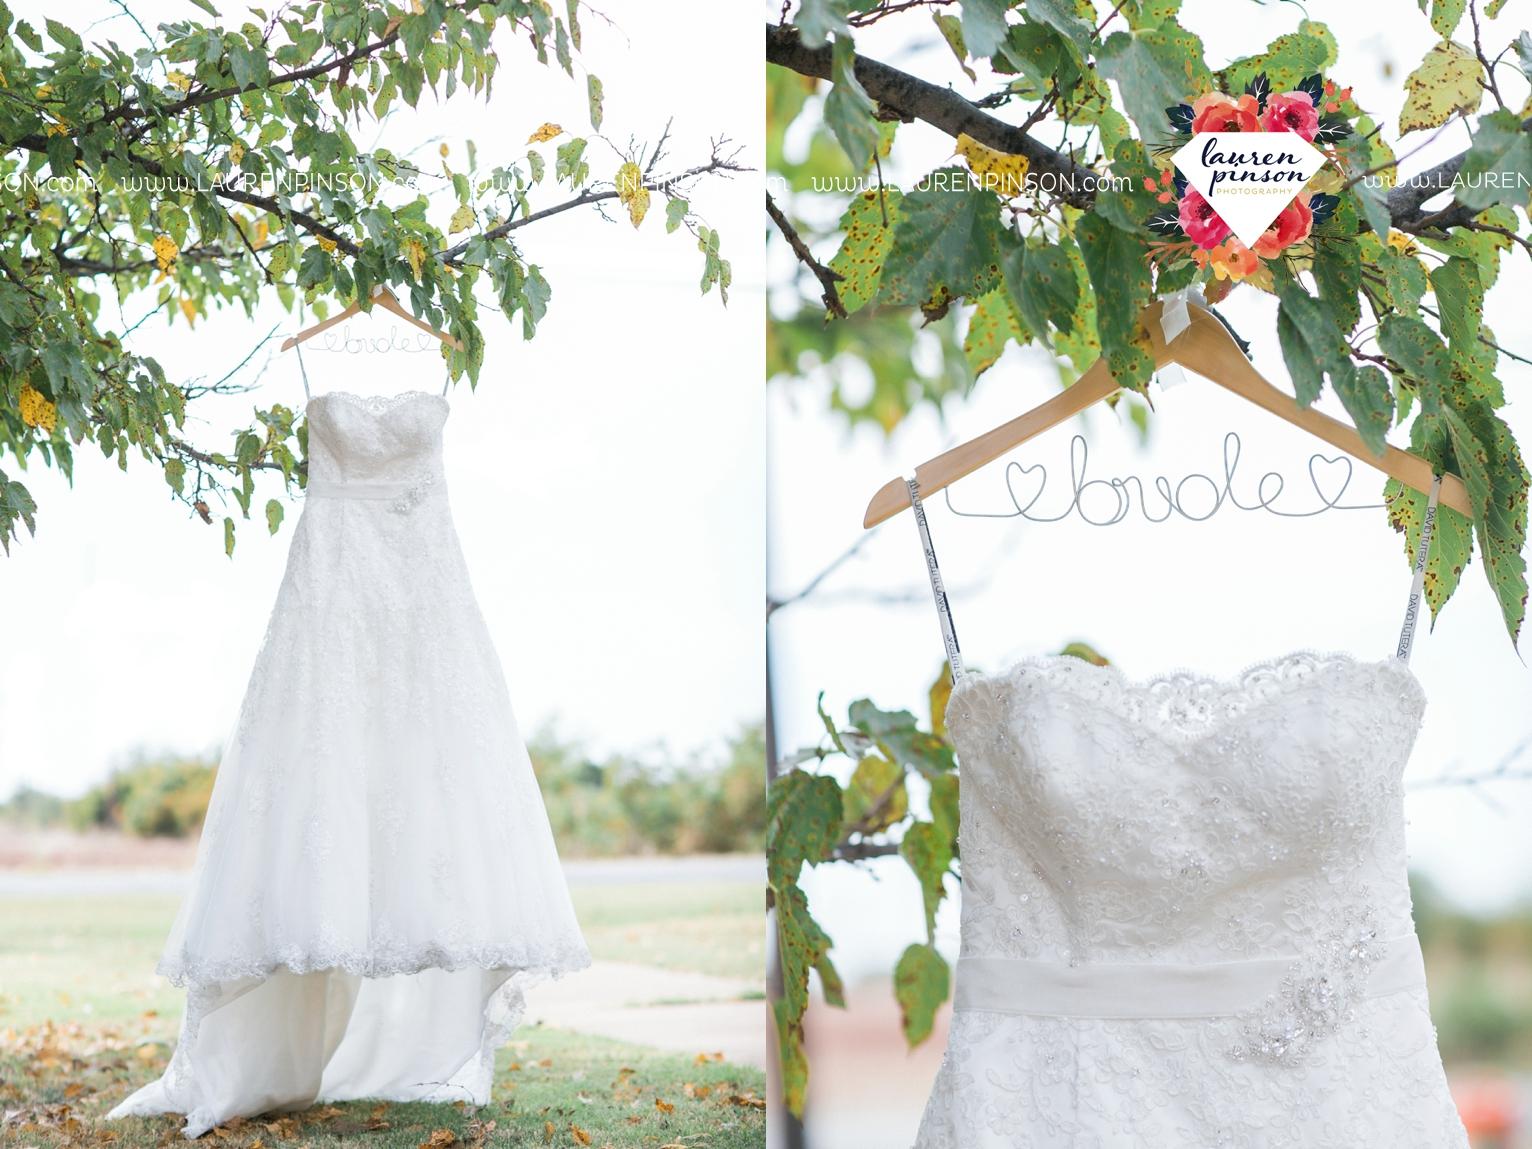 kemp-center-for-the-arts-wichita-falls-texas-wedding-photographer-fall-wedding-pumpkins-115.jpg